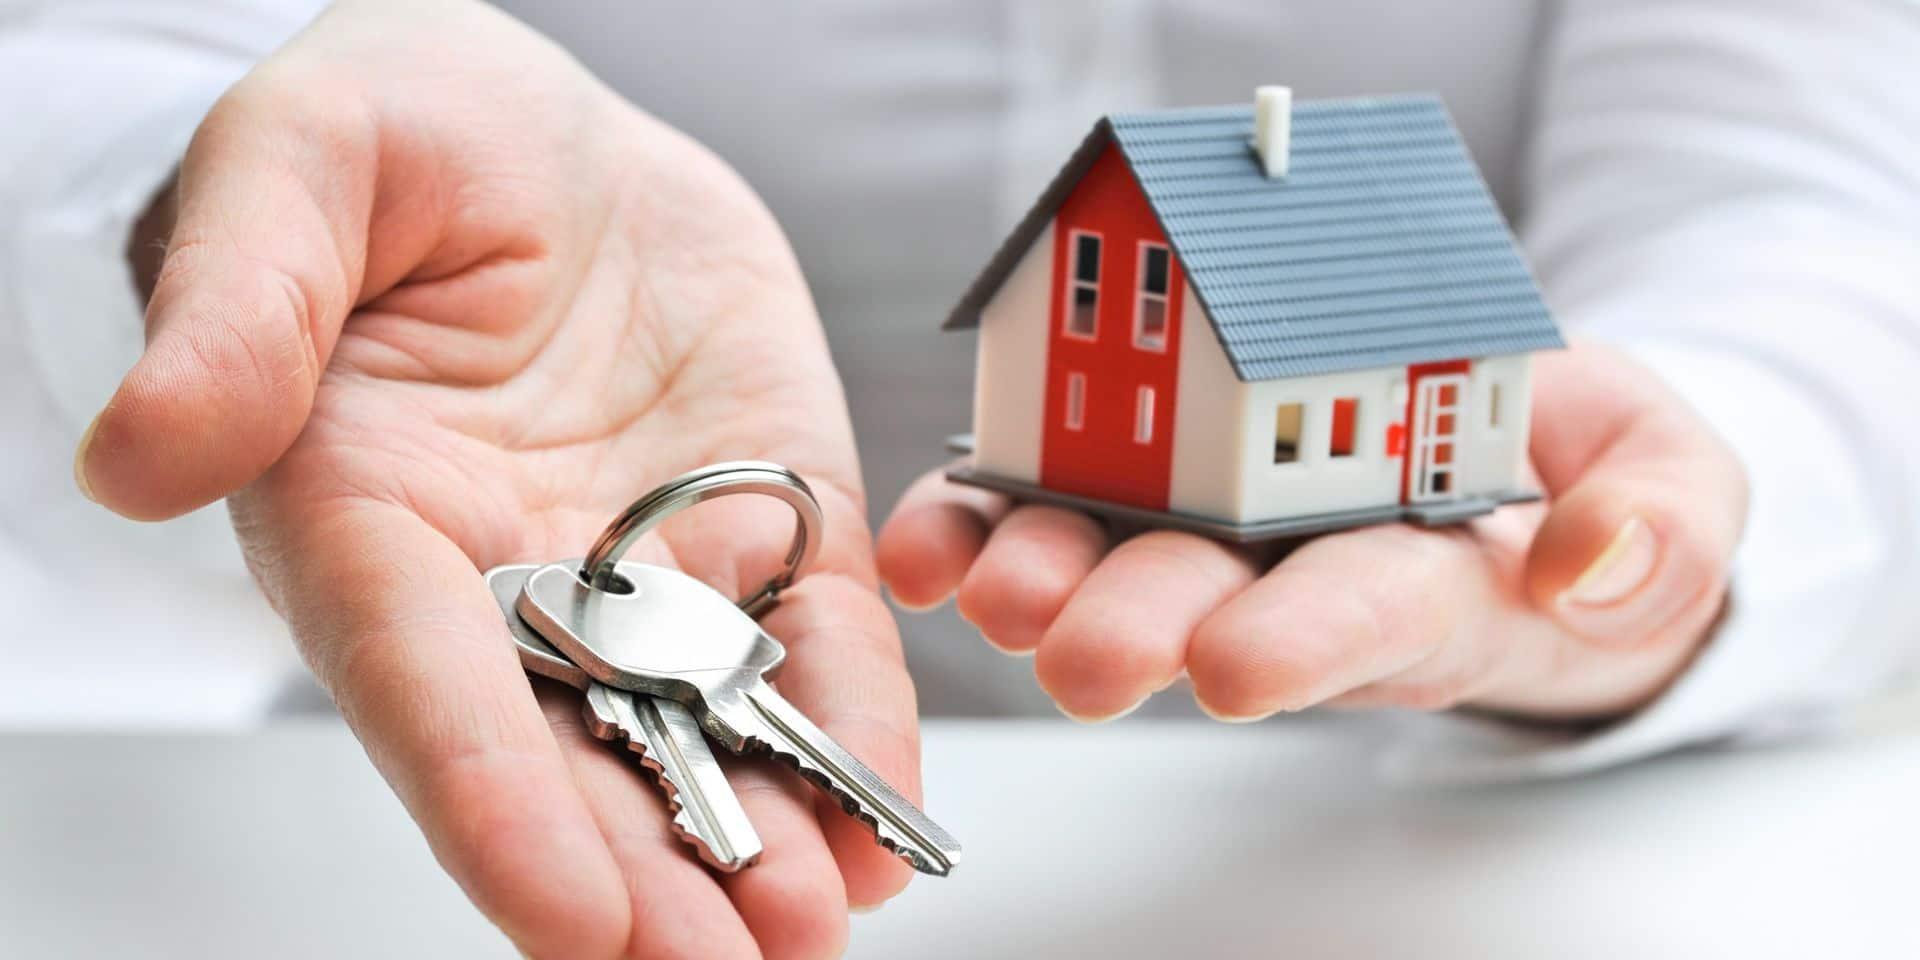 Immobilier: louer ou acheter en 2020?